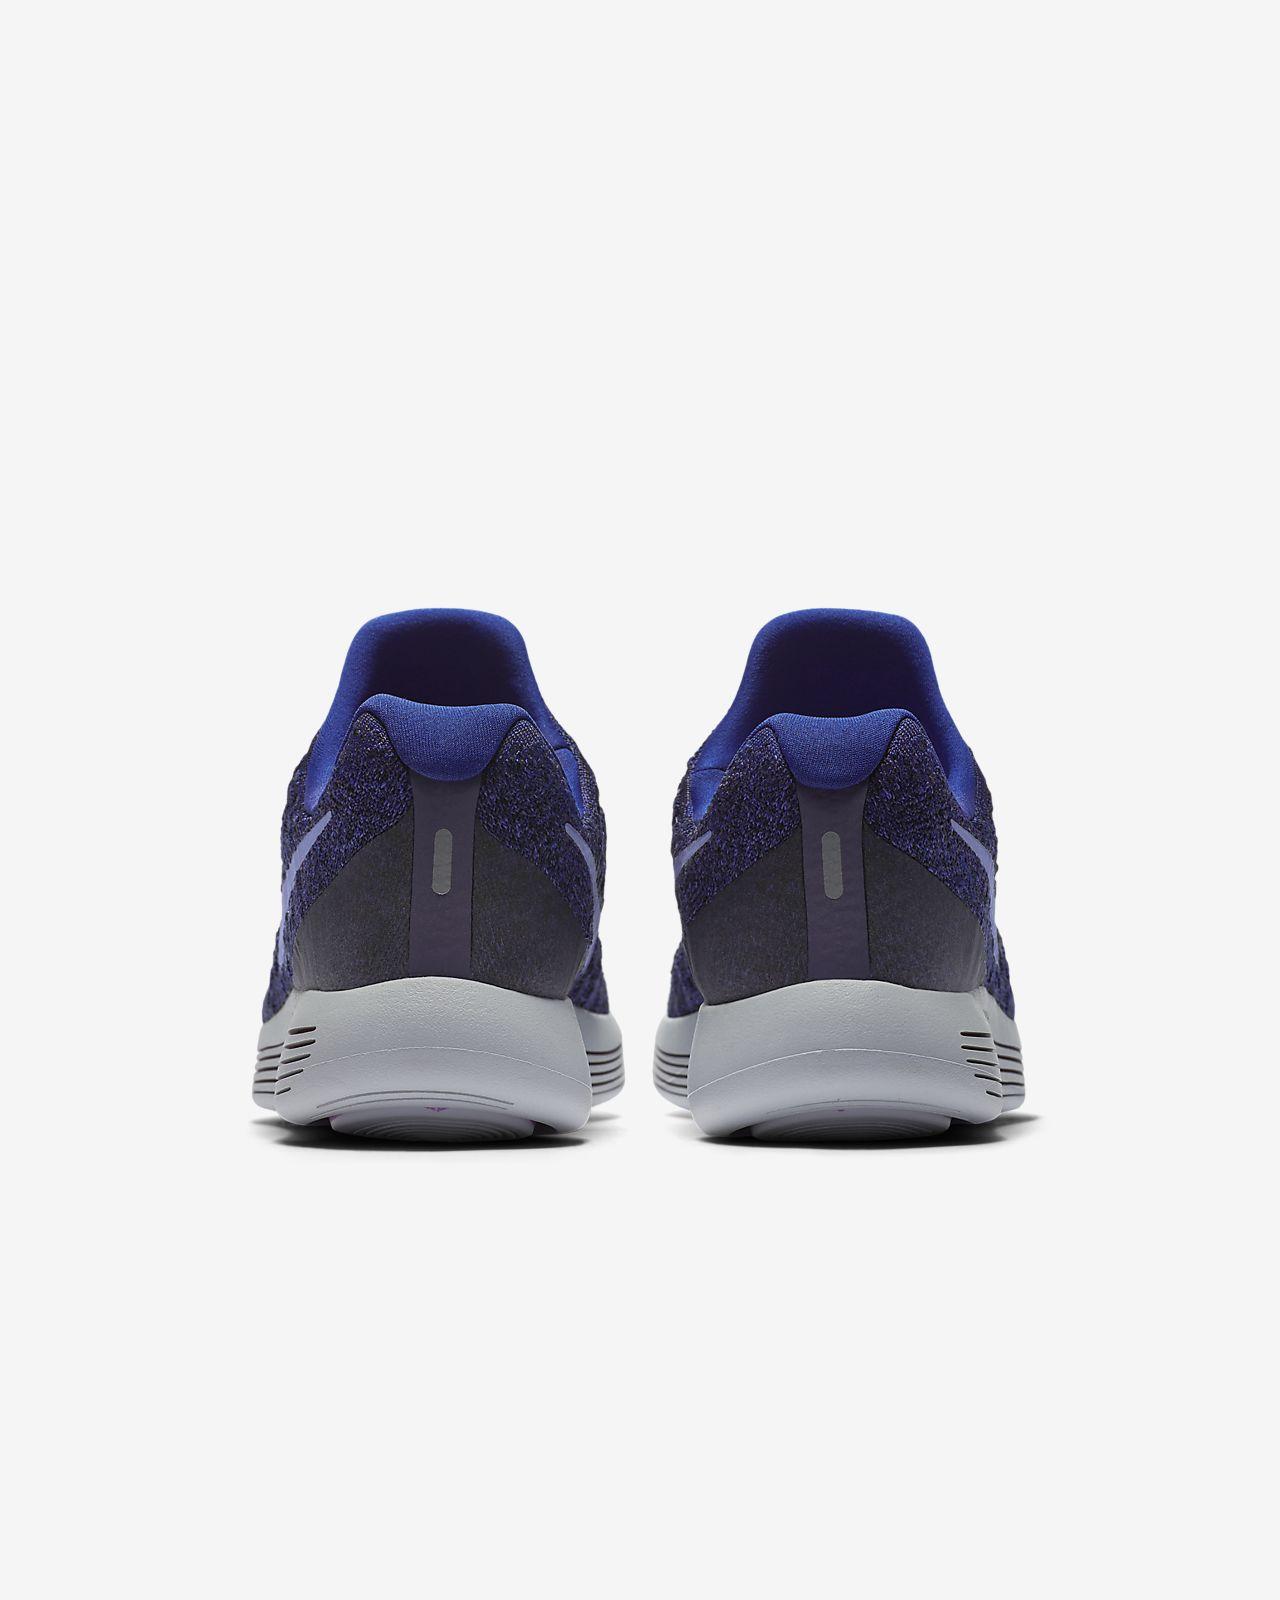 9c8a6073c9a9 Nike LunarEpic Low Flyknit 2 Women s Running Shoe. Nike.com IN